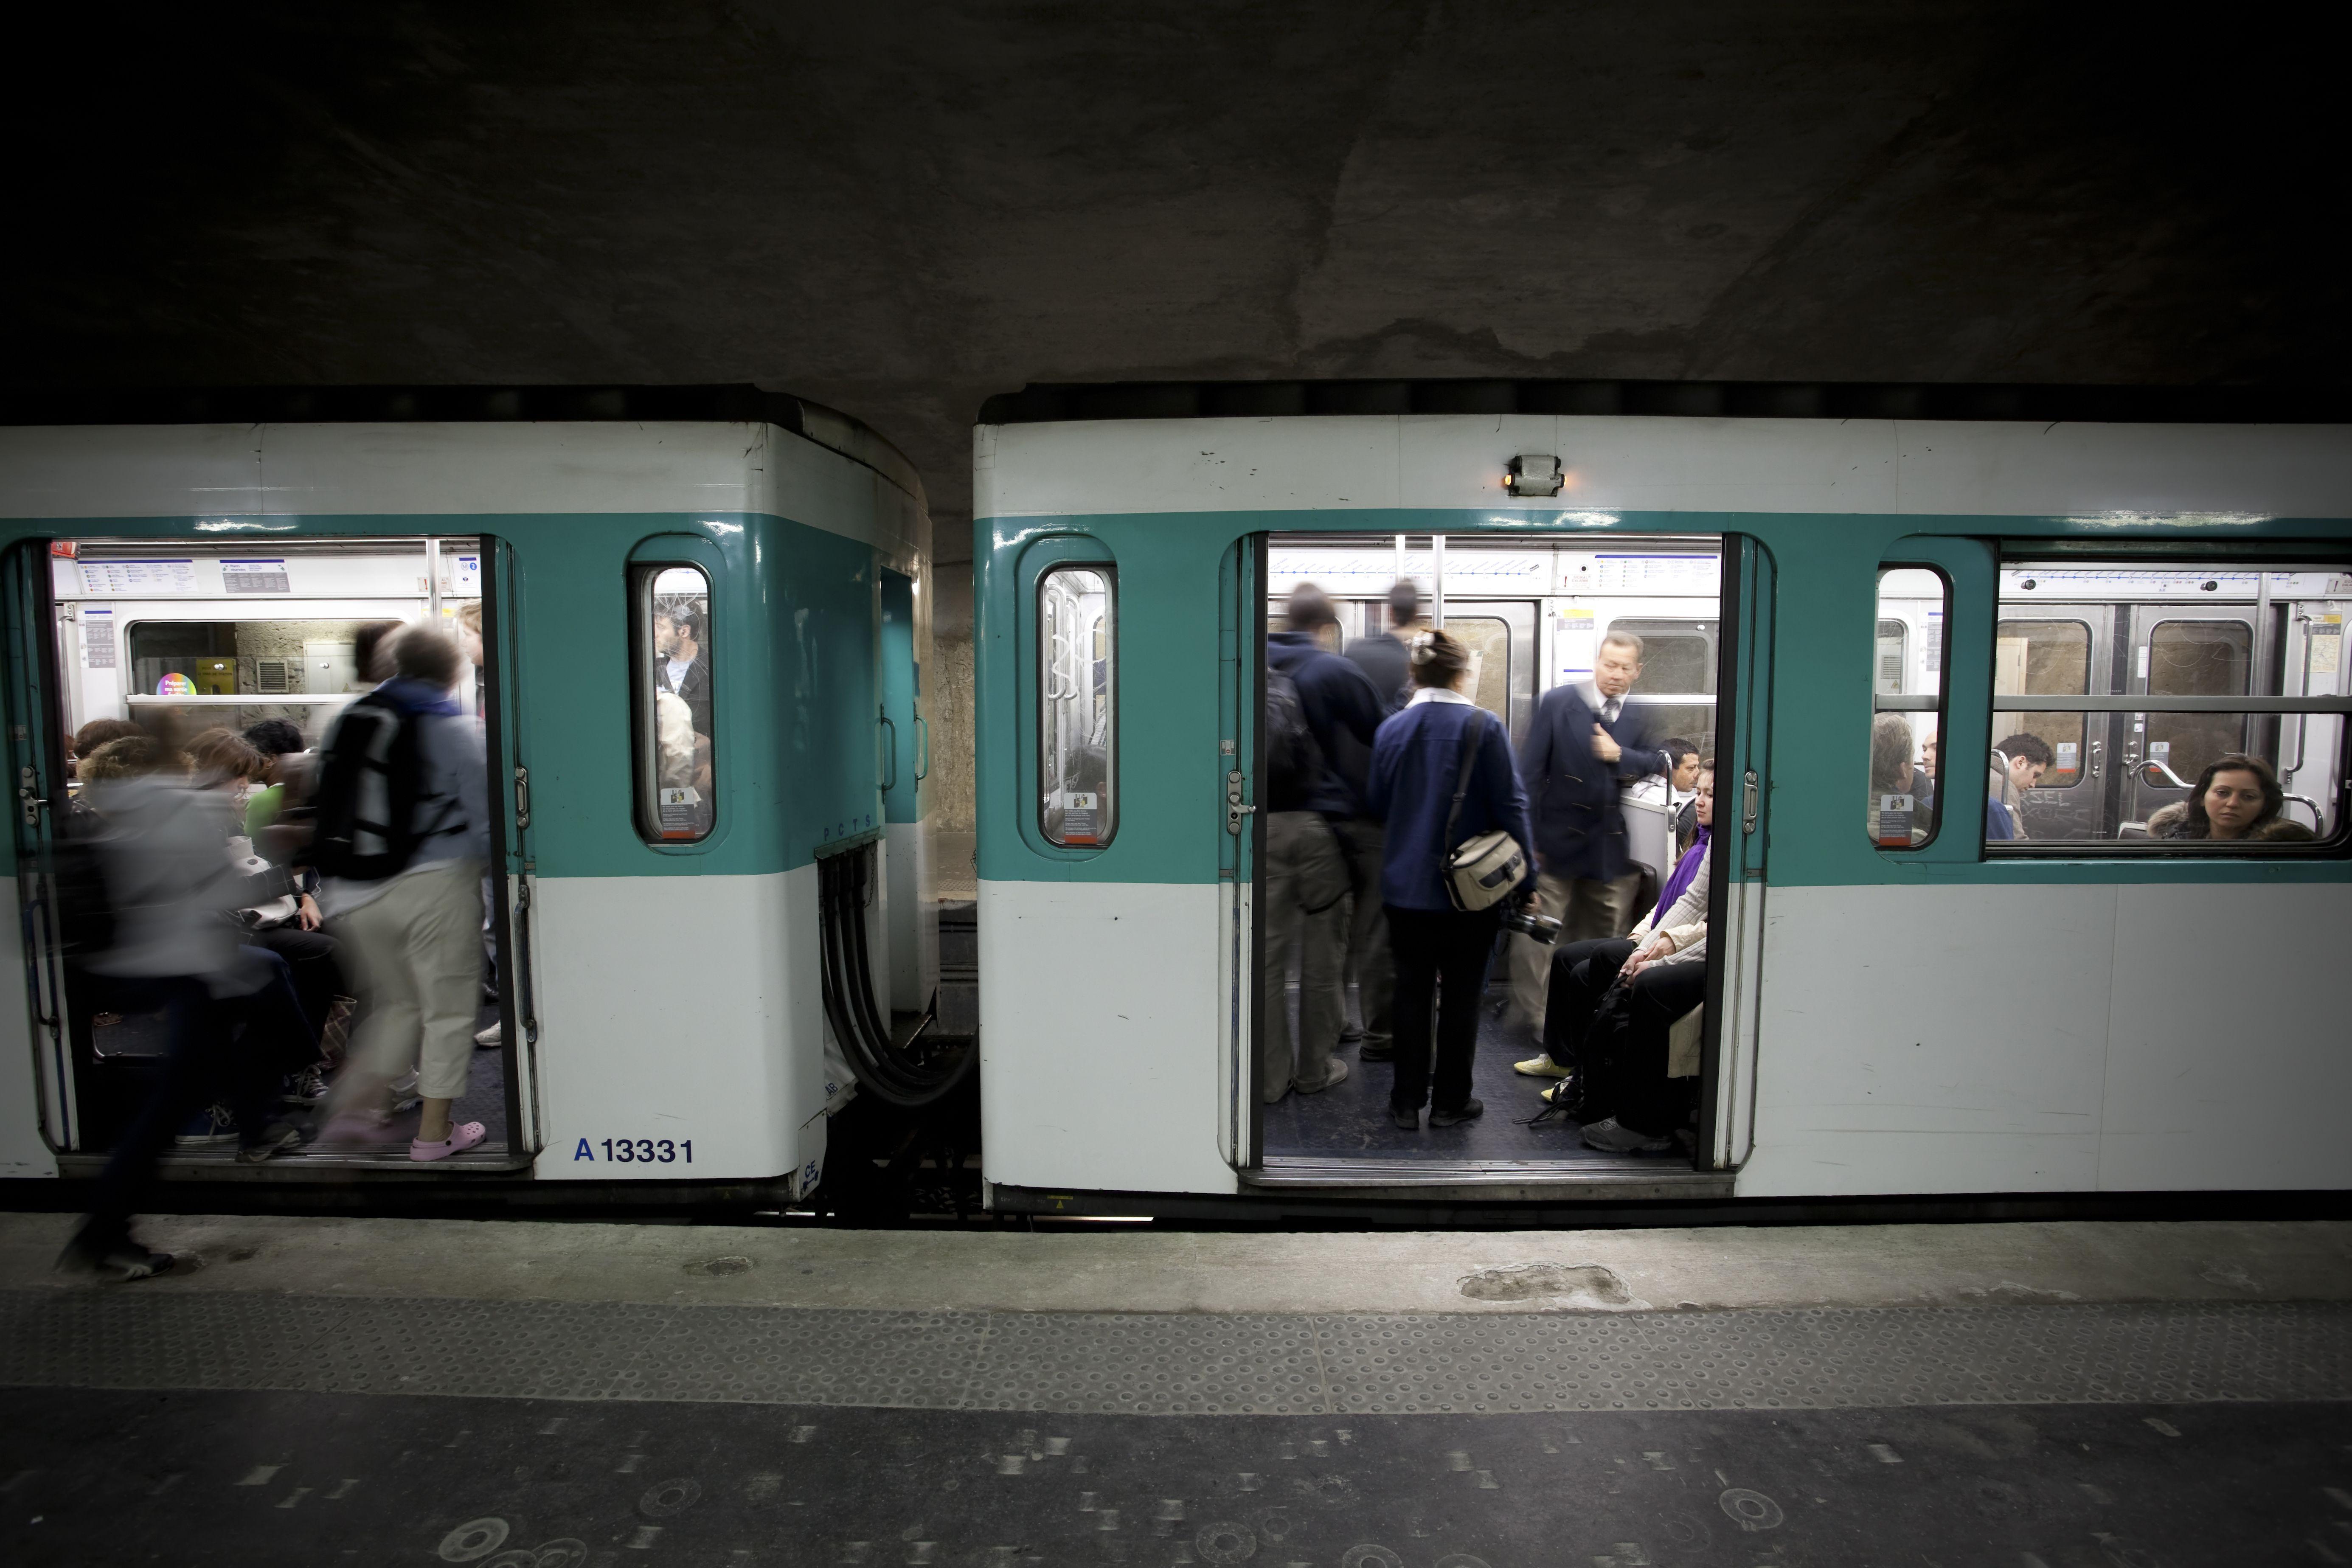 Boarding the metro in Paris, France.